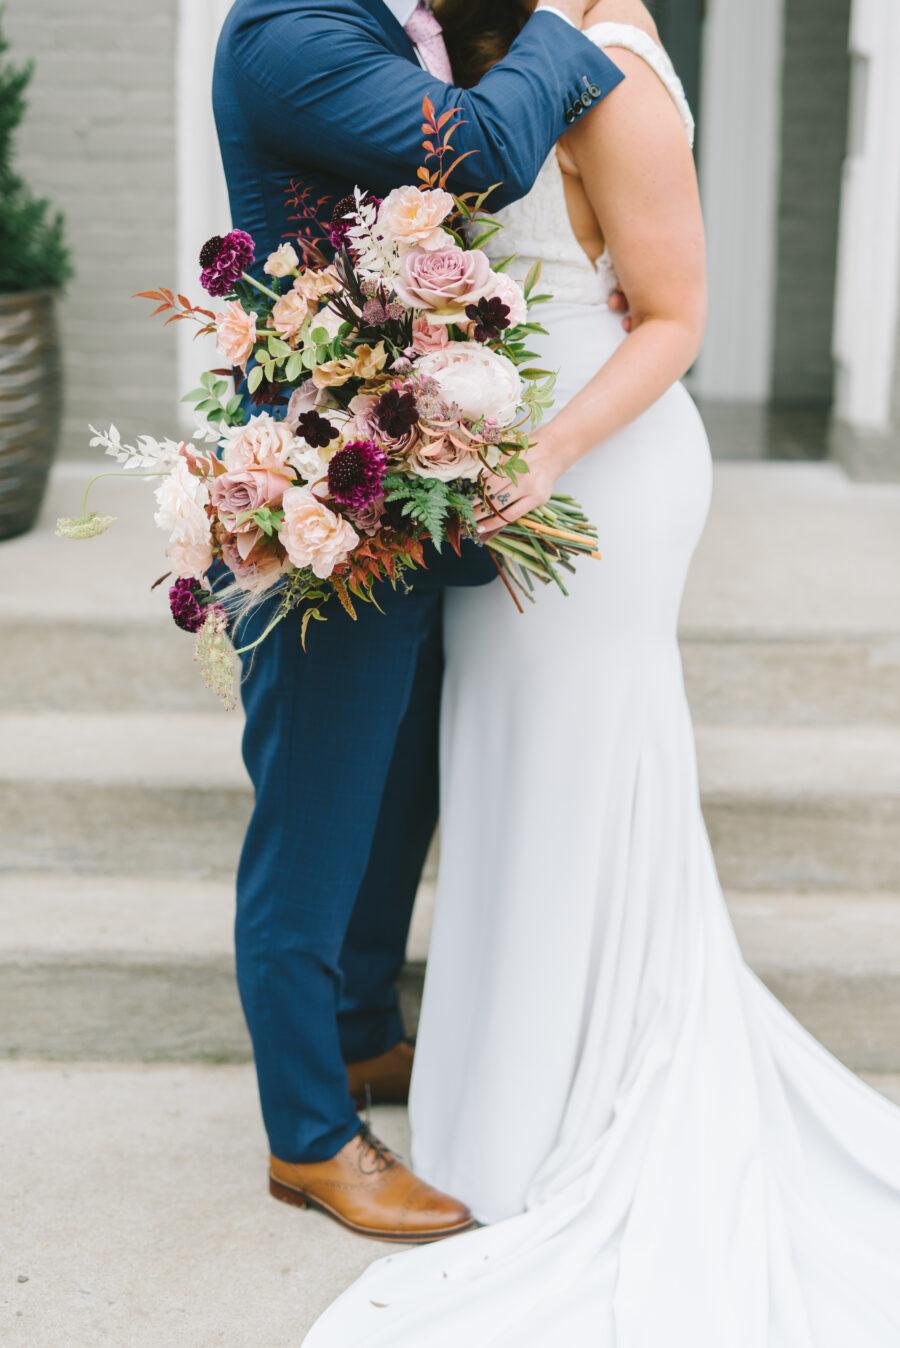 Rosemary & Finch Wedding Bouquet | Nashville Bride Guide